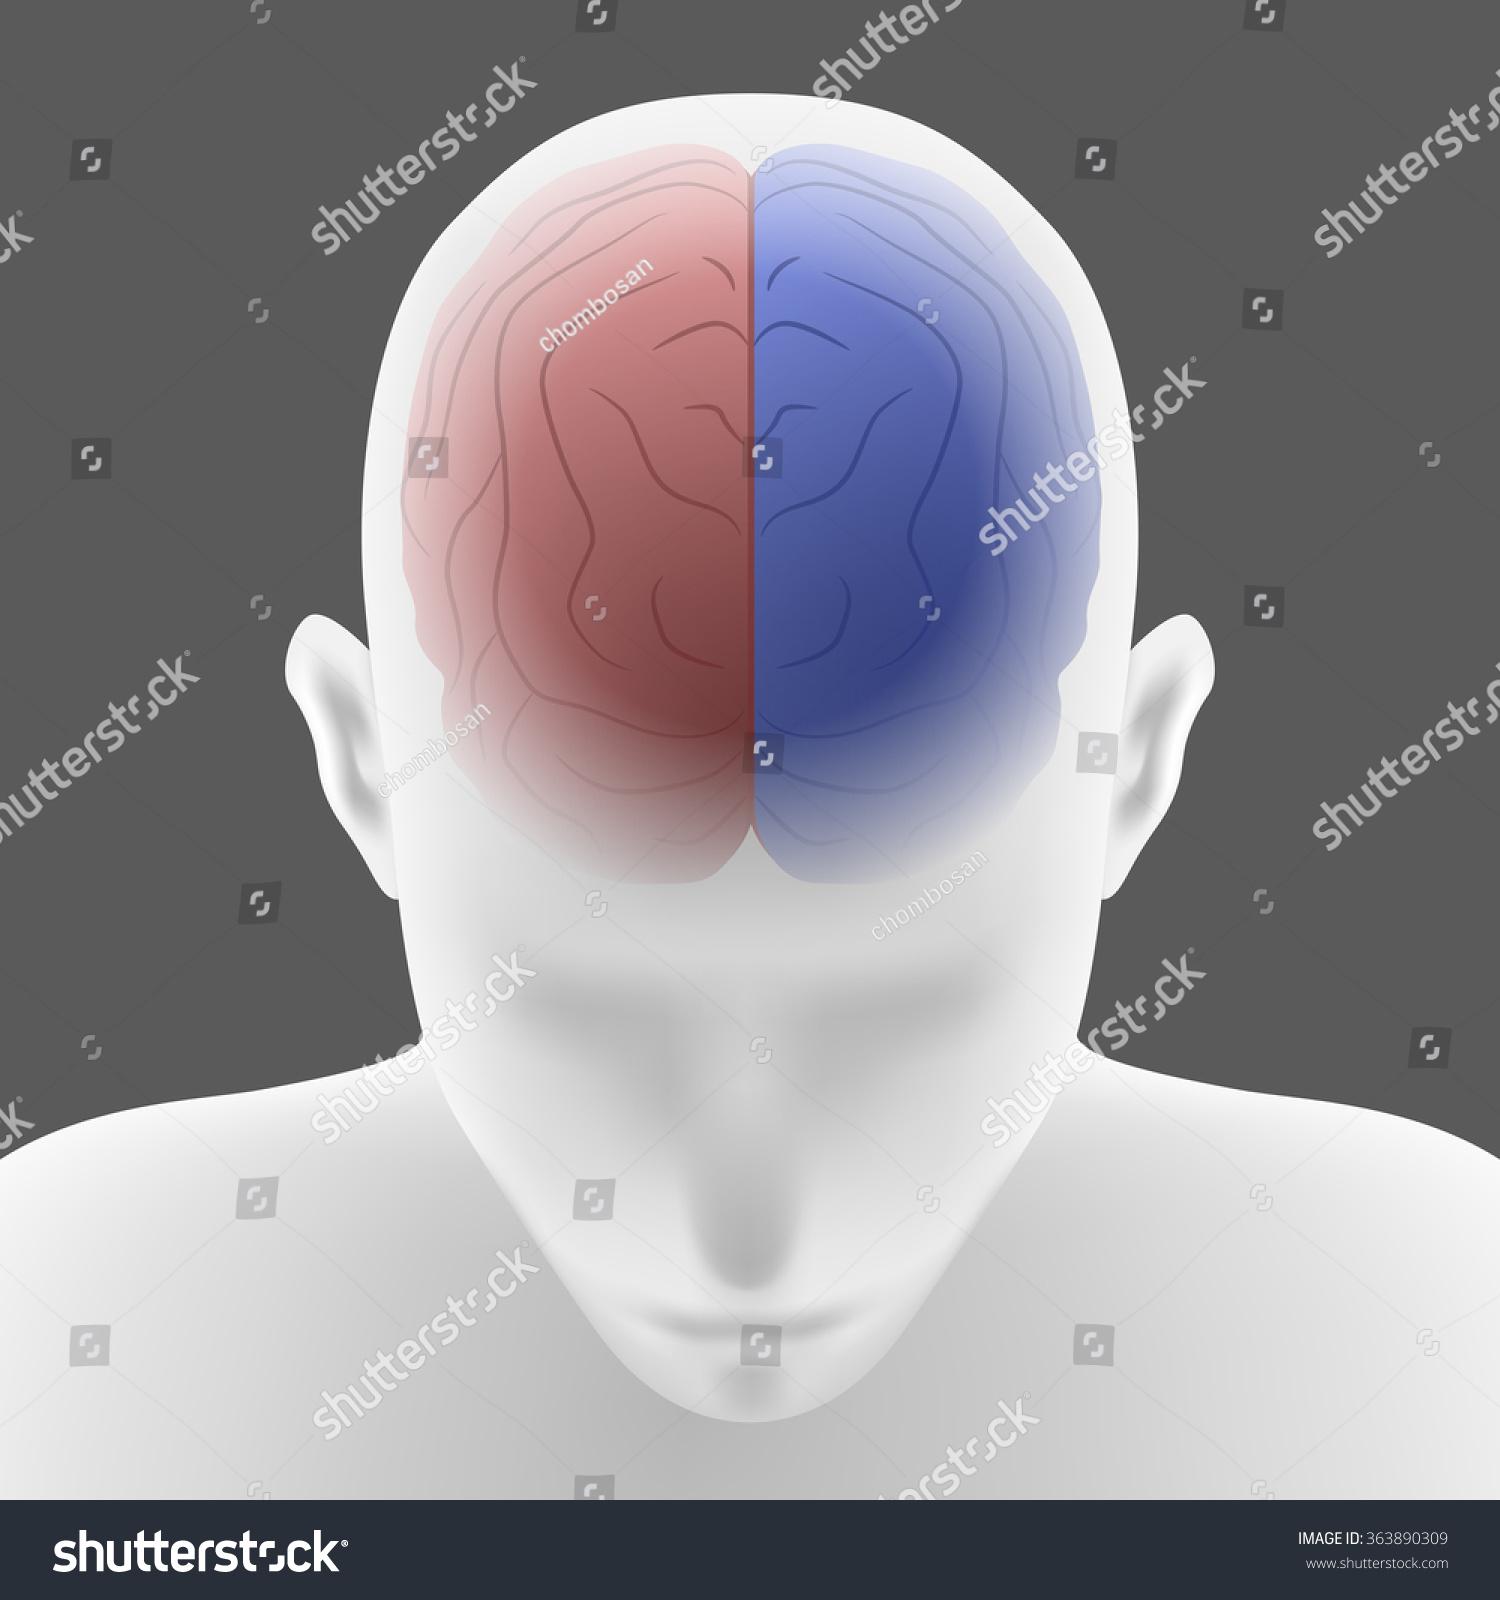 Right Brain Left Brain Human Head Stock Vector 363890309 ...